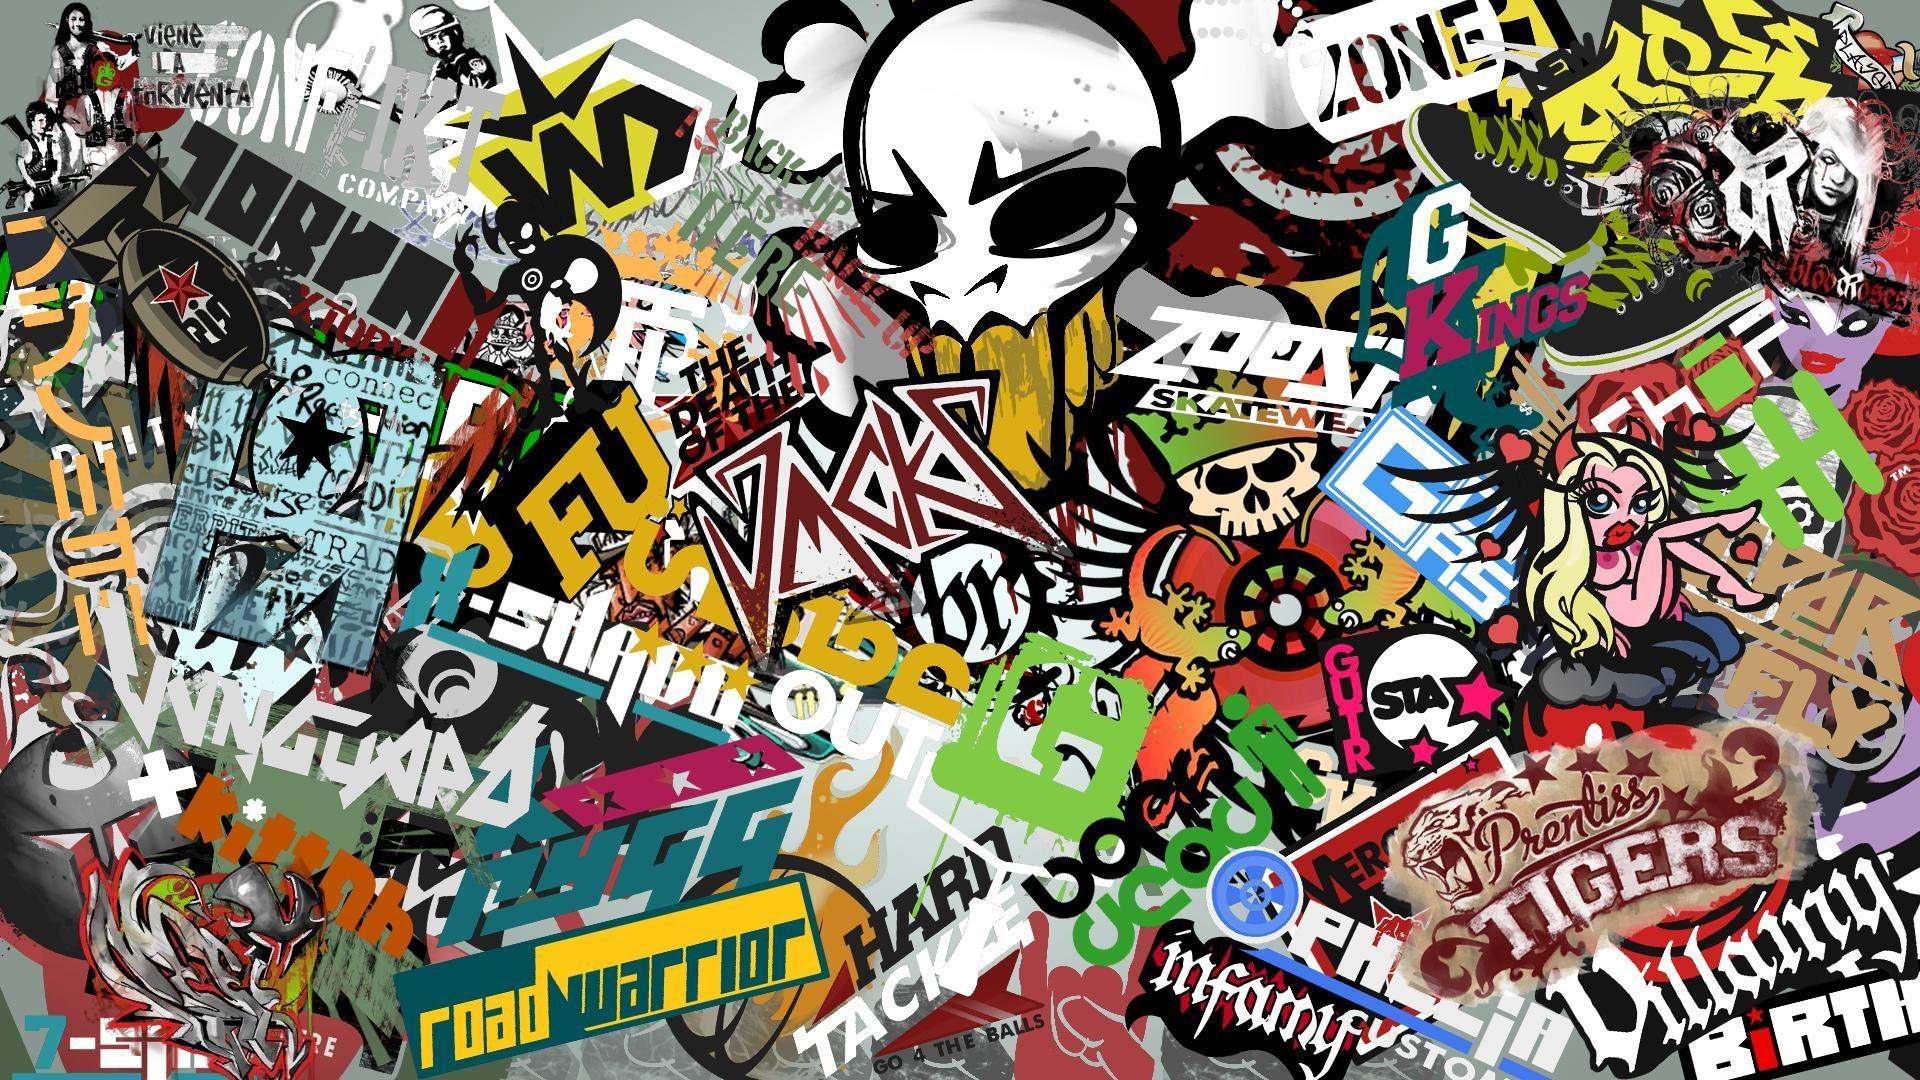 Great Sticker Bomb Wallpaper Hd Wallpapers Of Nature - 1080p Sticker Bomb - HD Wallpaper